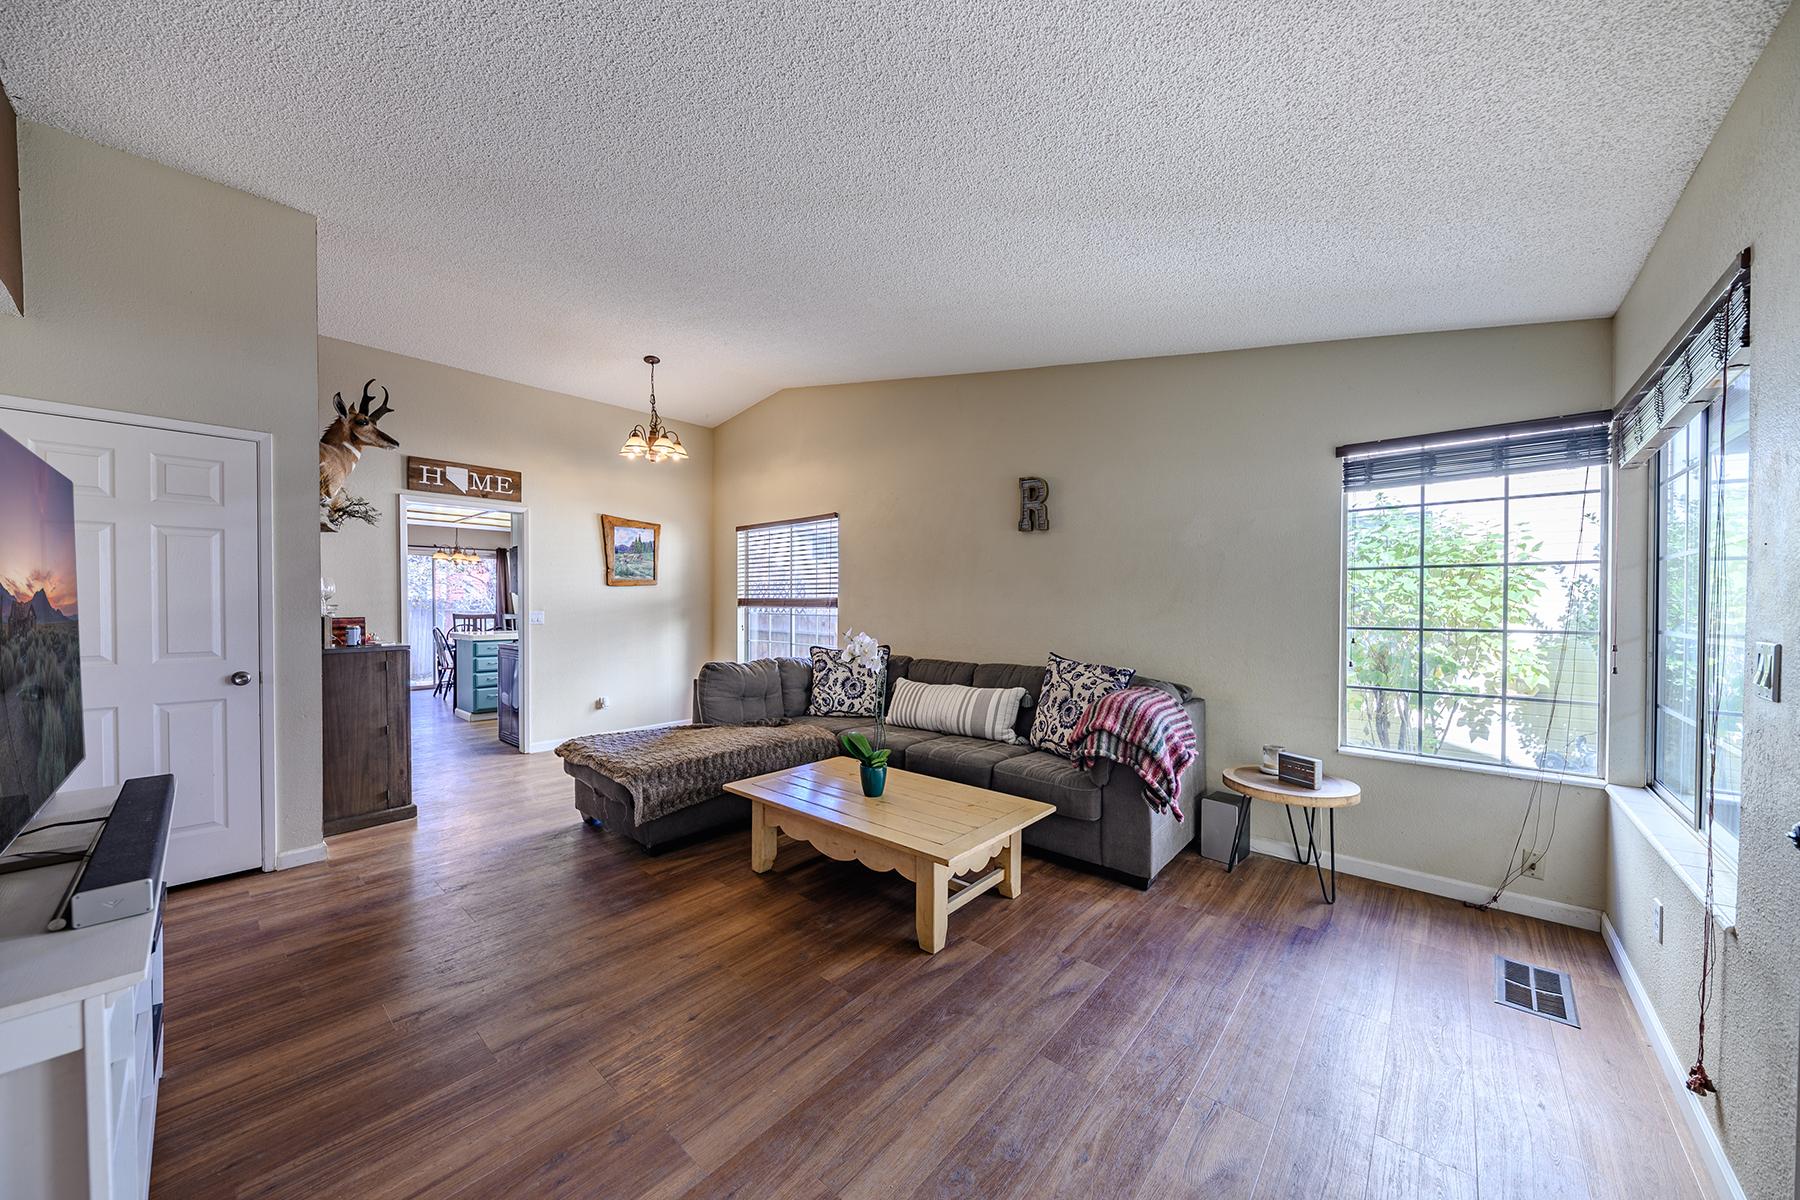 Single Family Homes pour l Vente à 1287 Express Street, Sparks, Nevada Sparks, Nevada 89434 États-Unis